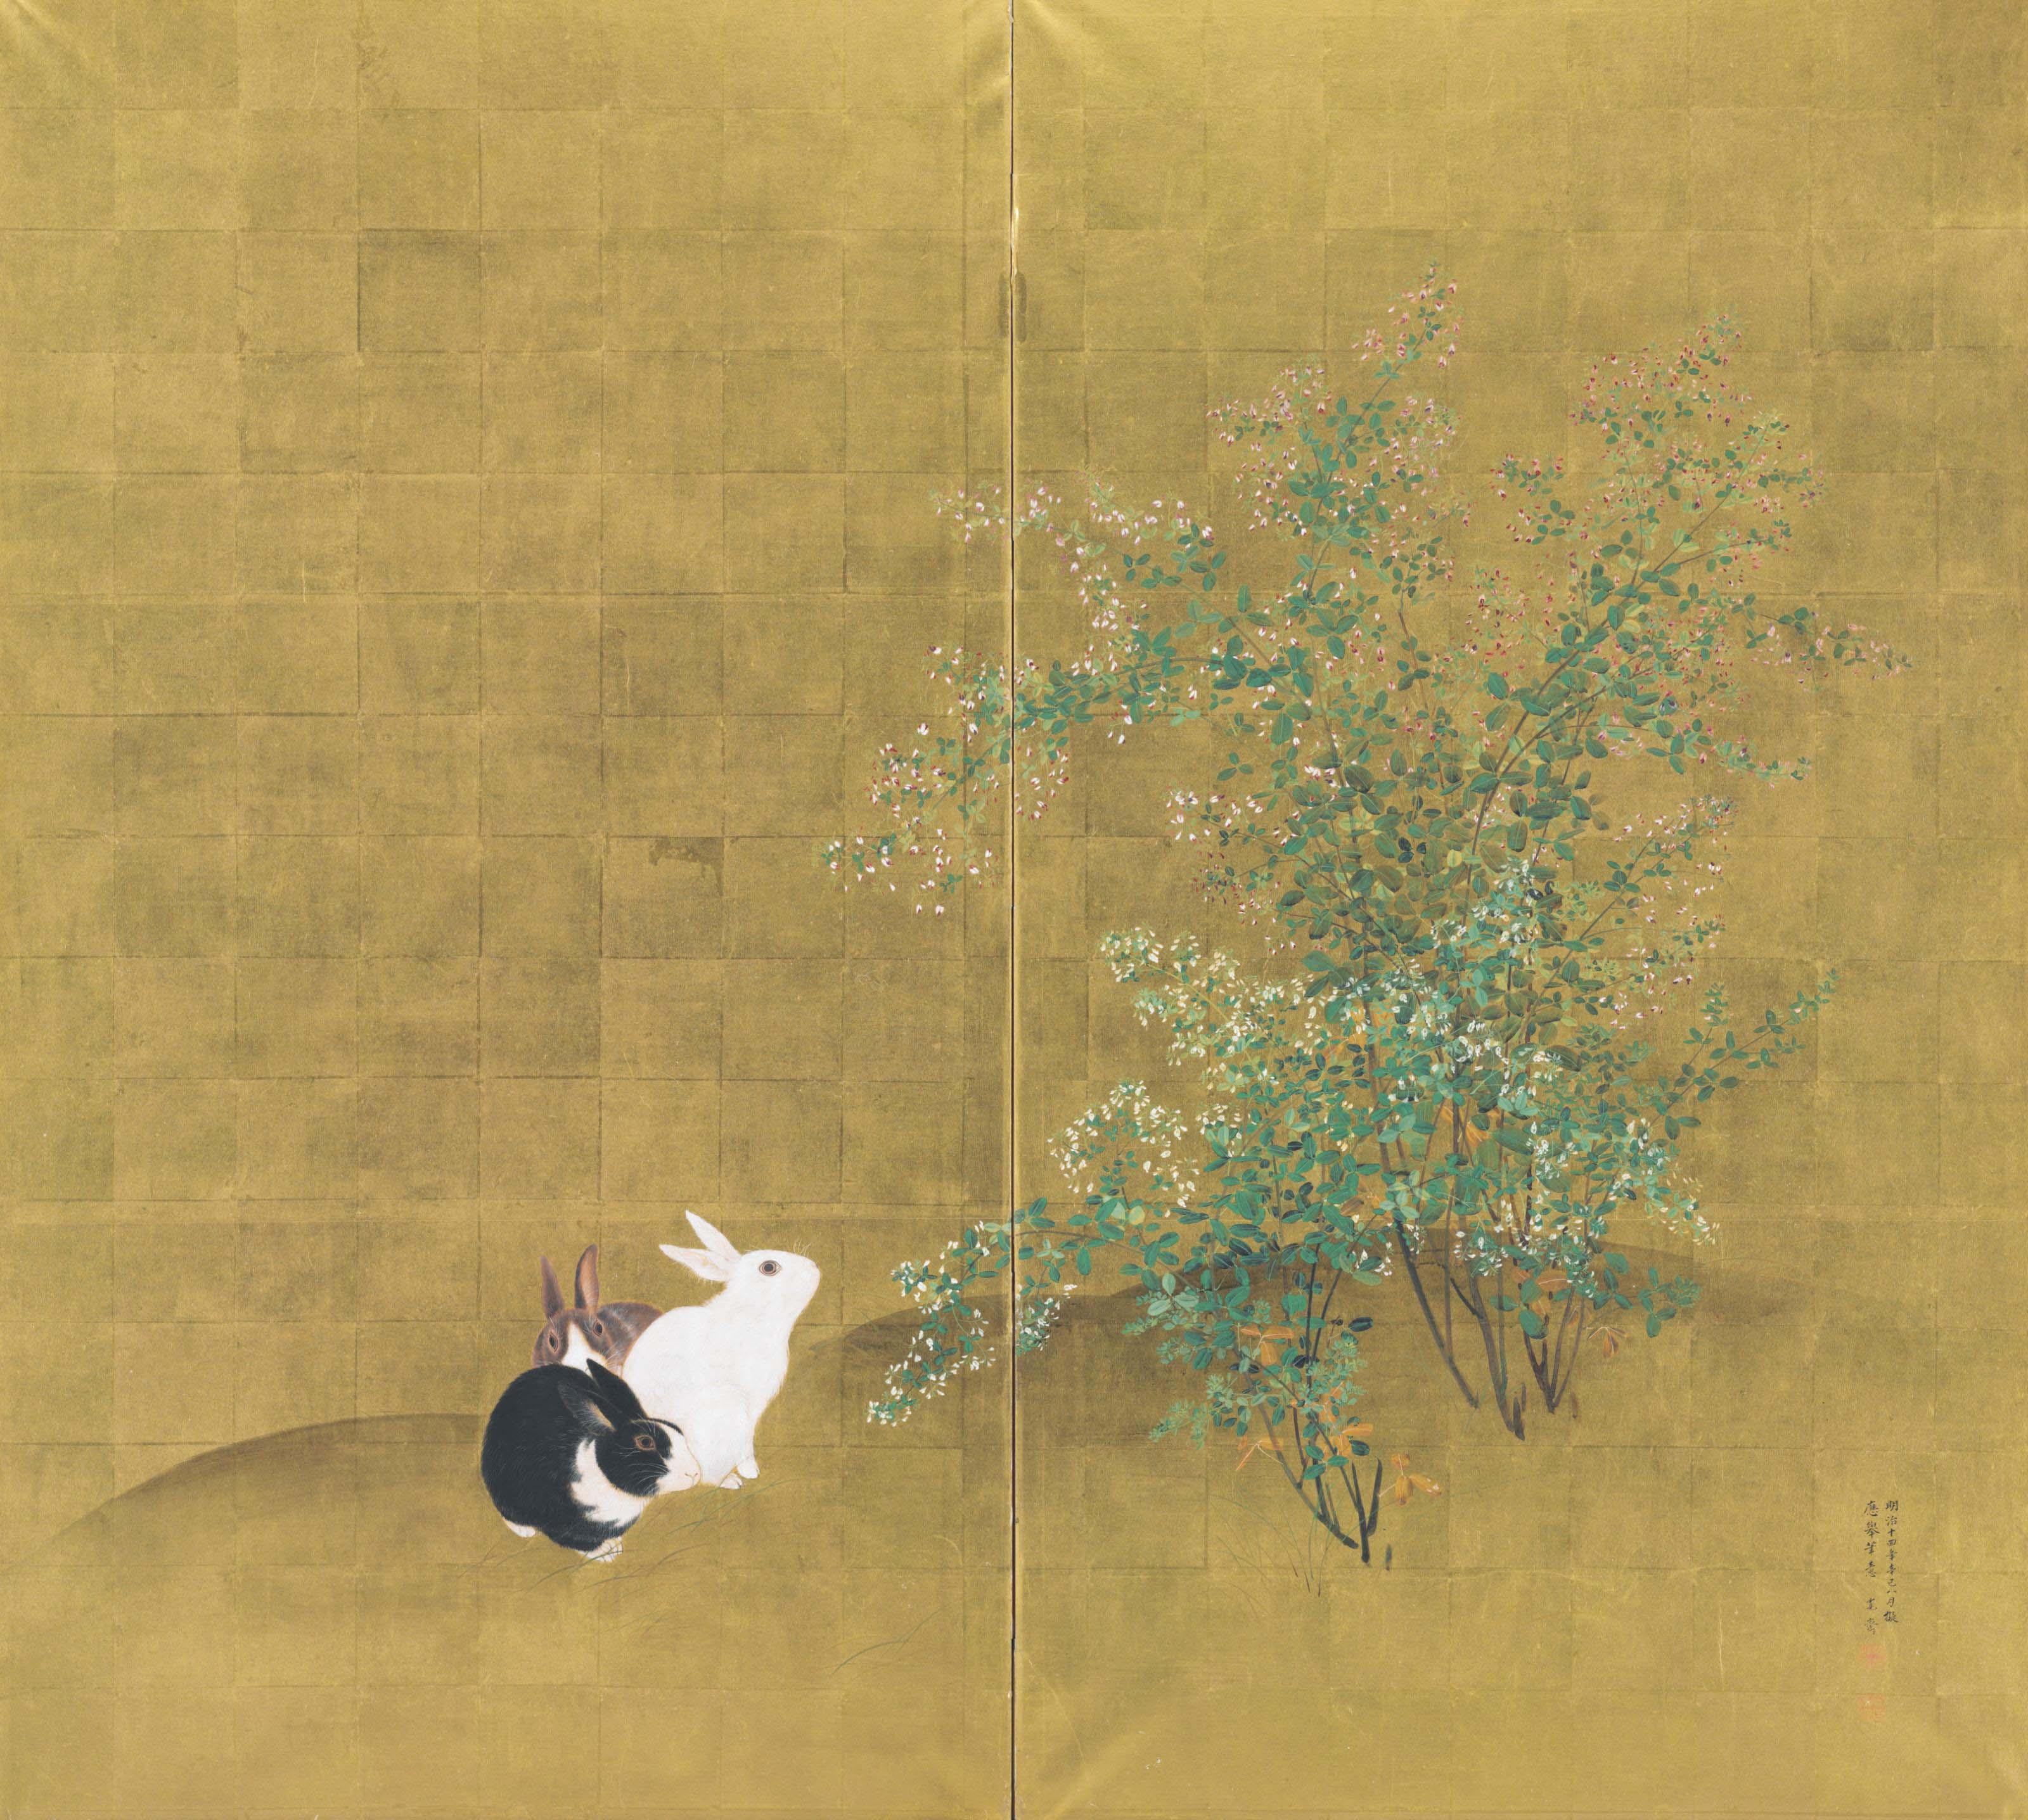 Mori Kansai (1814-1894)